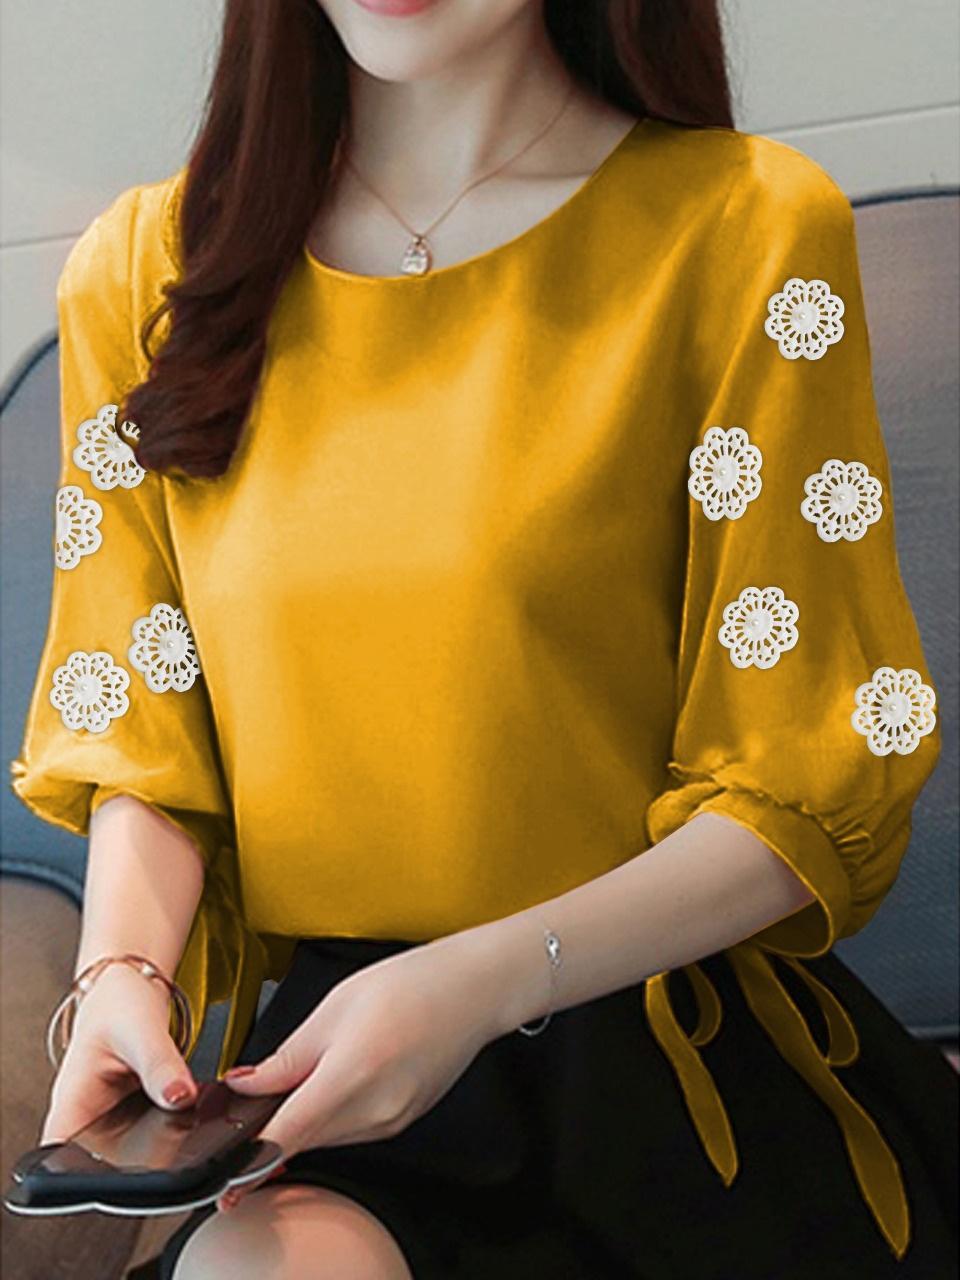 [ bisa bayar ditempat / cod ] fs – agatha knit blouse rajut #hzr blouse wanita blouse wanita lengan panjang blouse wanita  blouse wanita jumbo blouse wanita korea blouse putih wanita blouse putih wanita lengan panjang blouse anak perempuan blouse